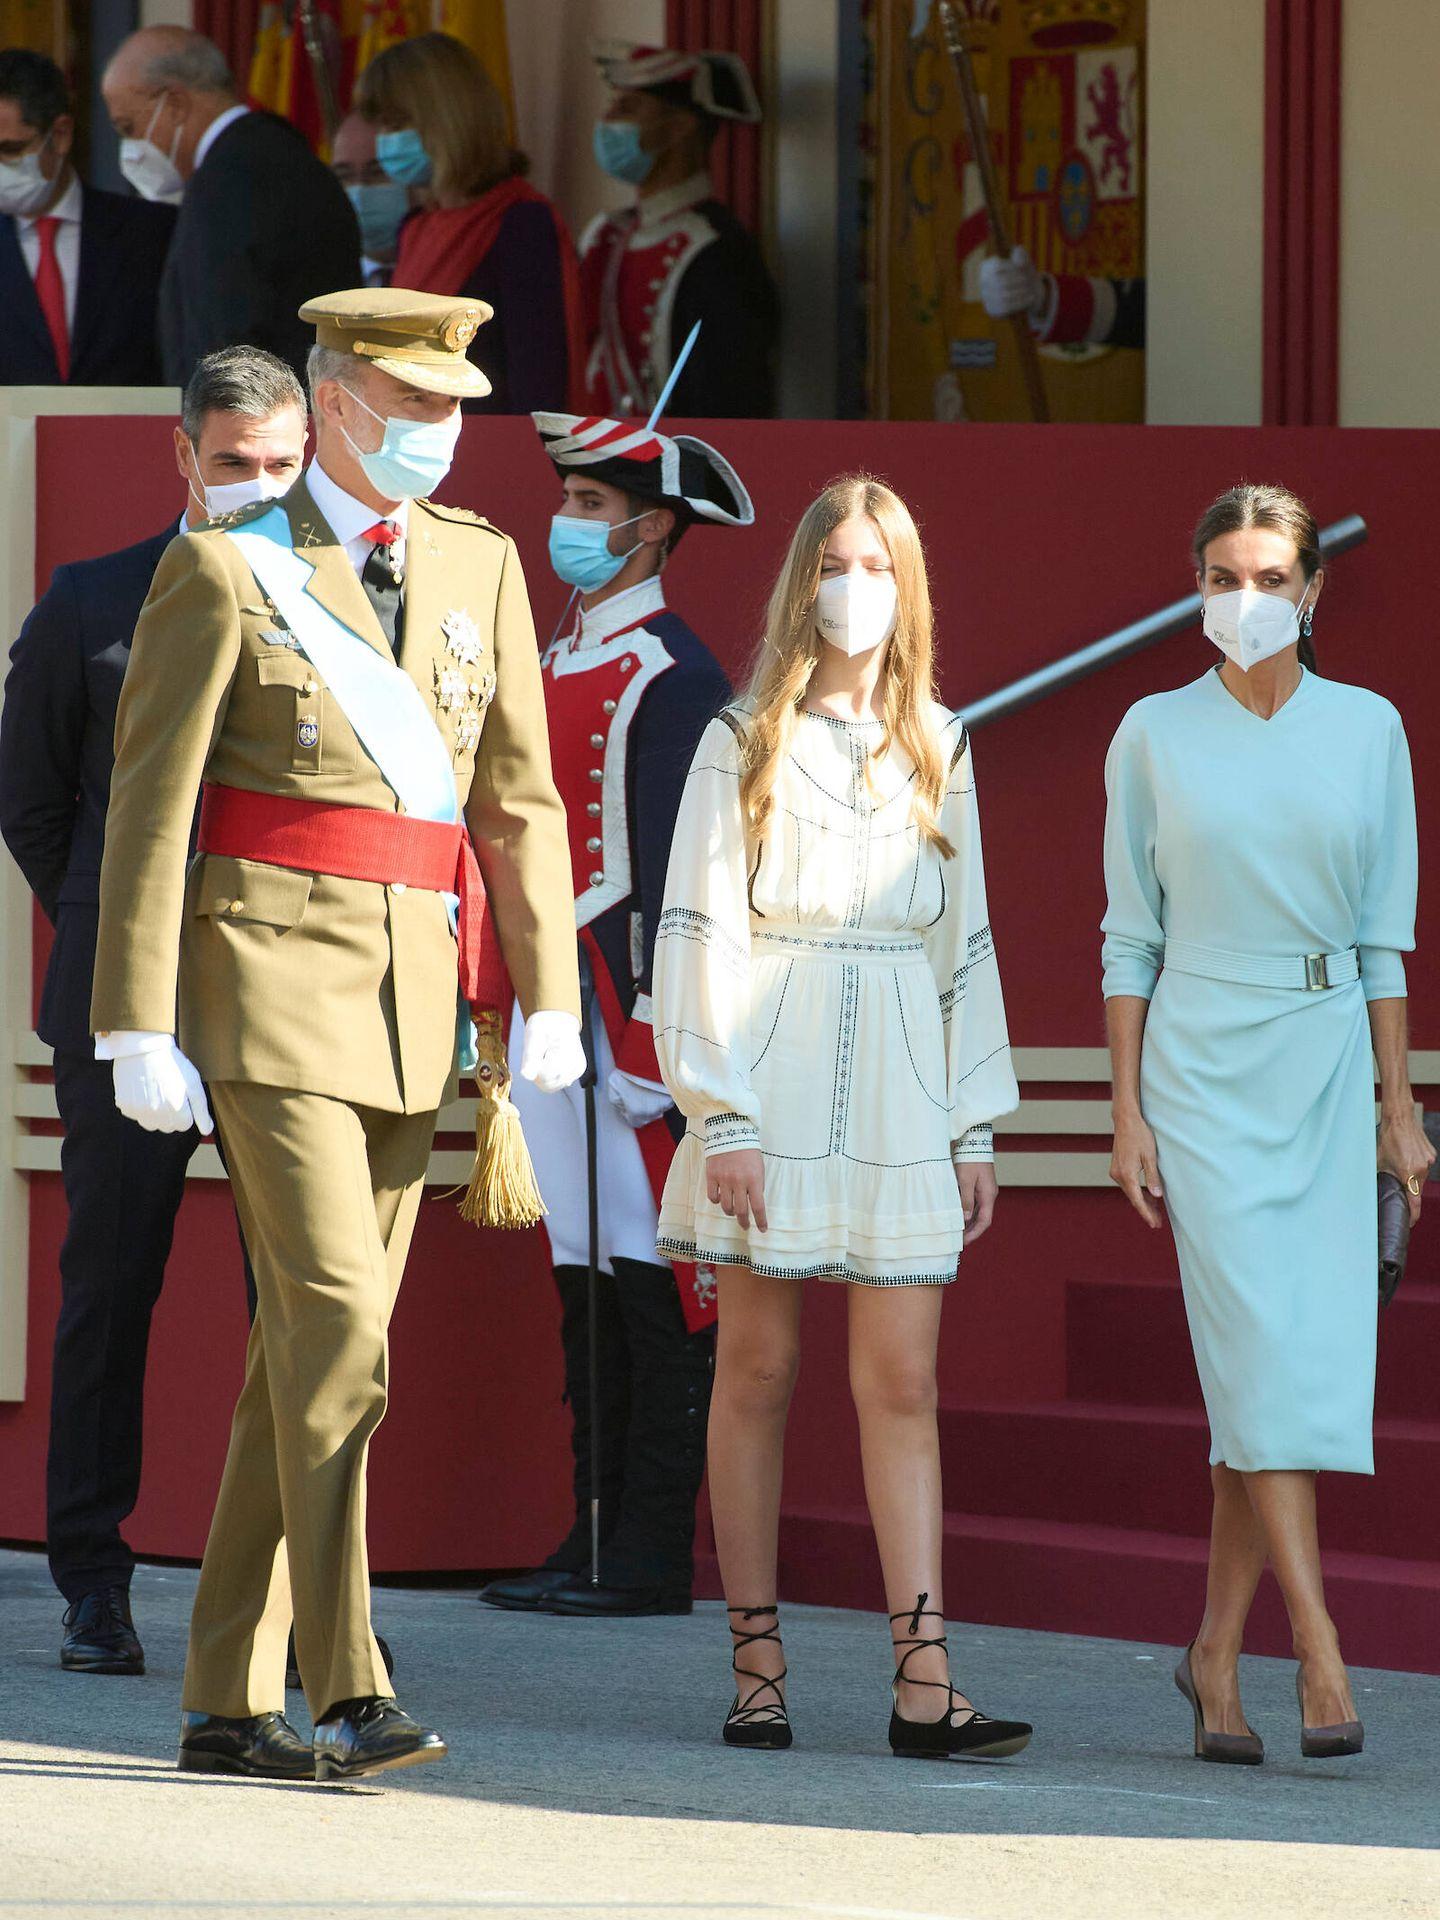 La familia real, en el desfile militar. (Limited Pictures)